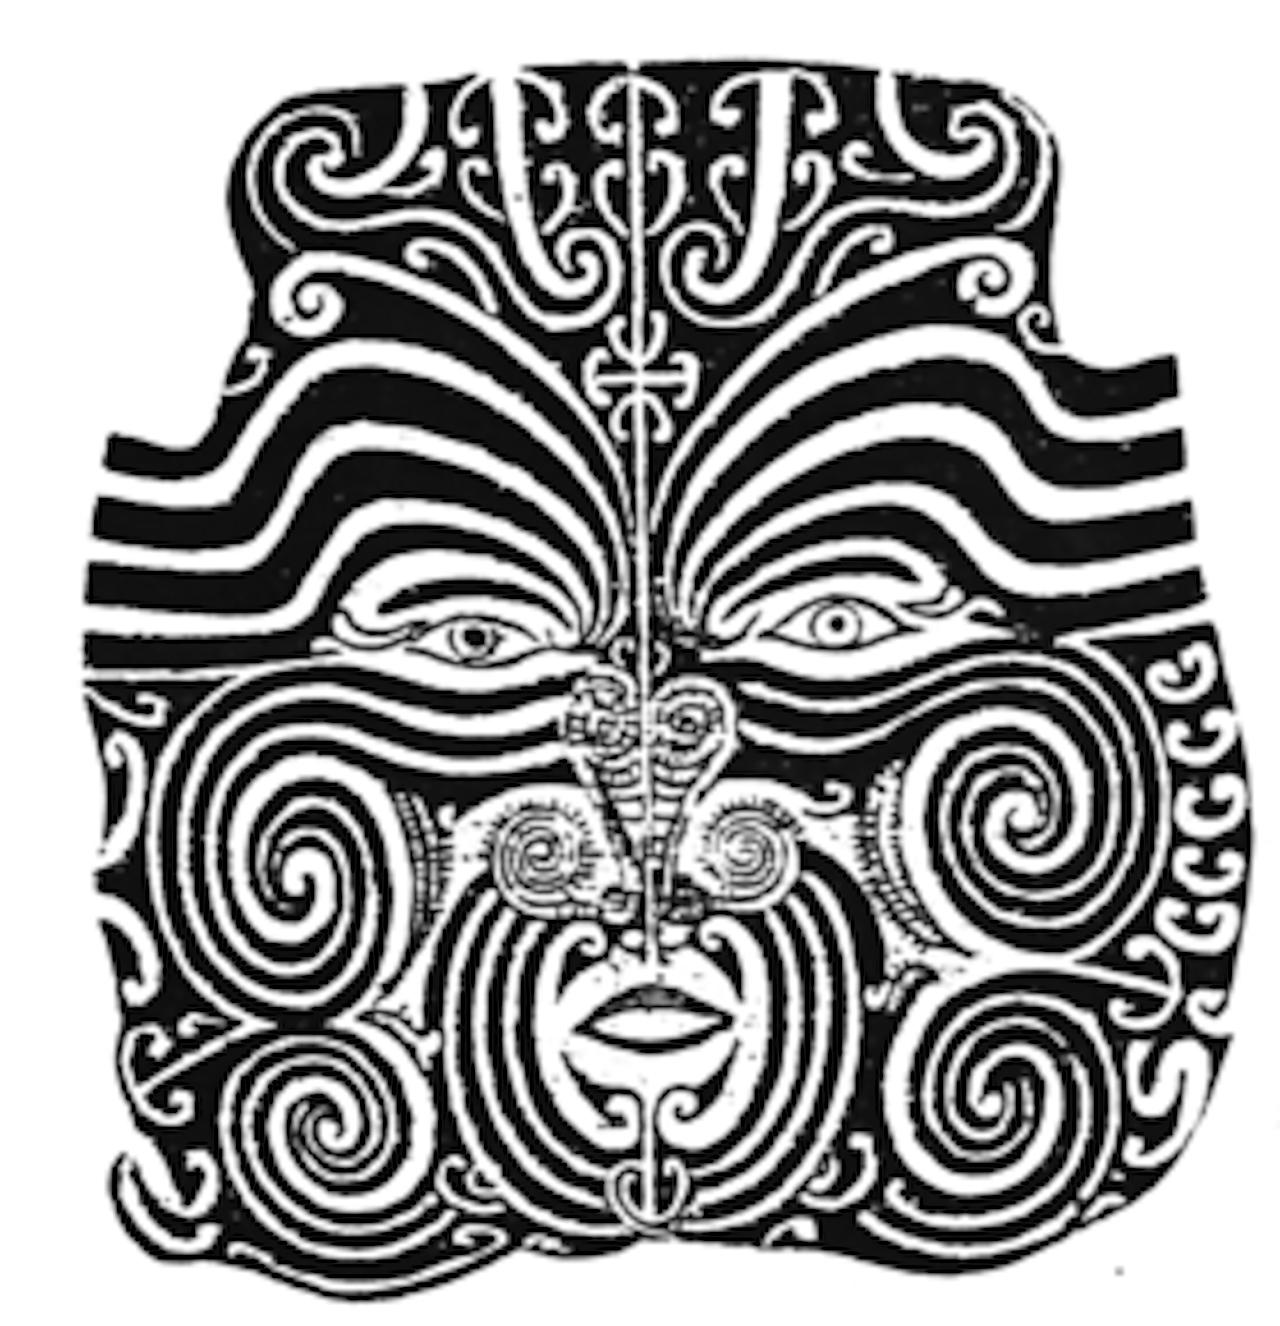 Self-portrait by Maori rangatira Te Pehi Kupe, circa 1826